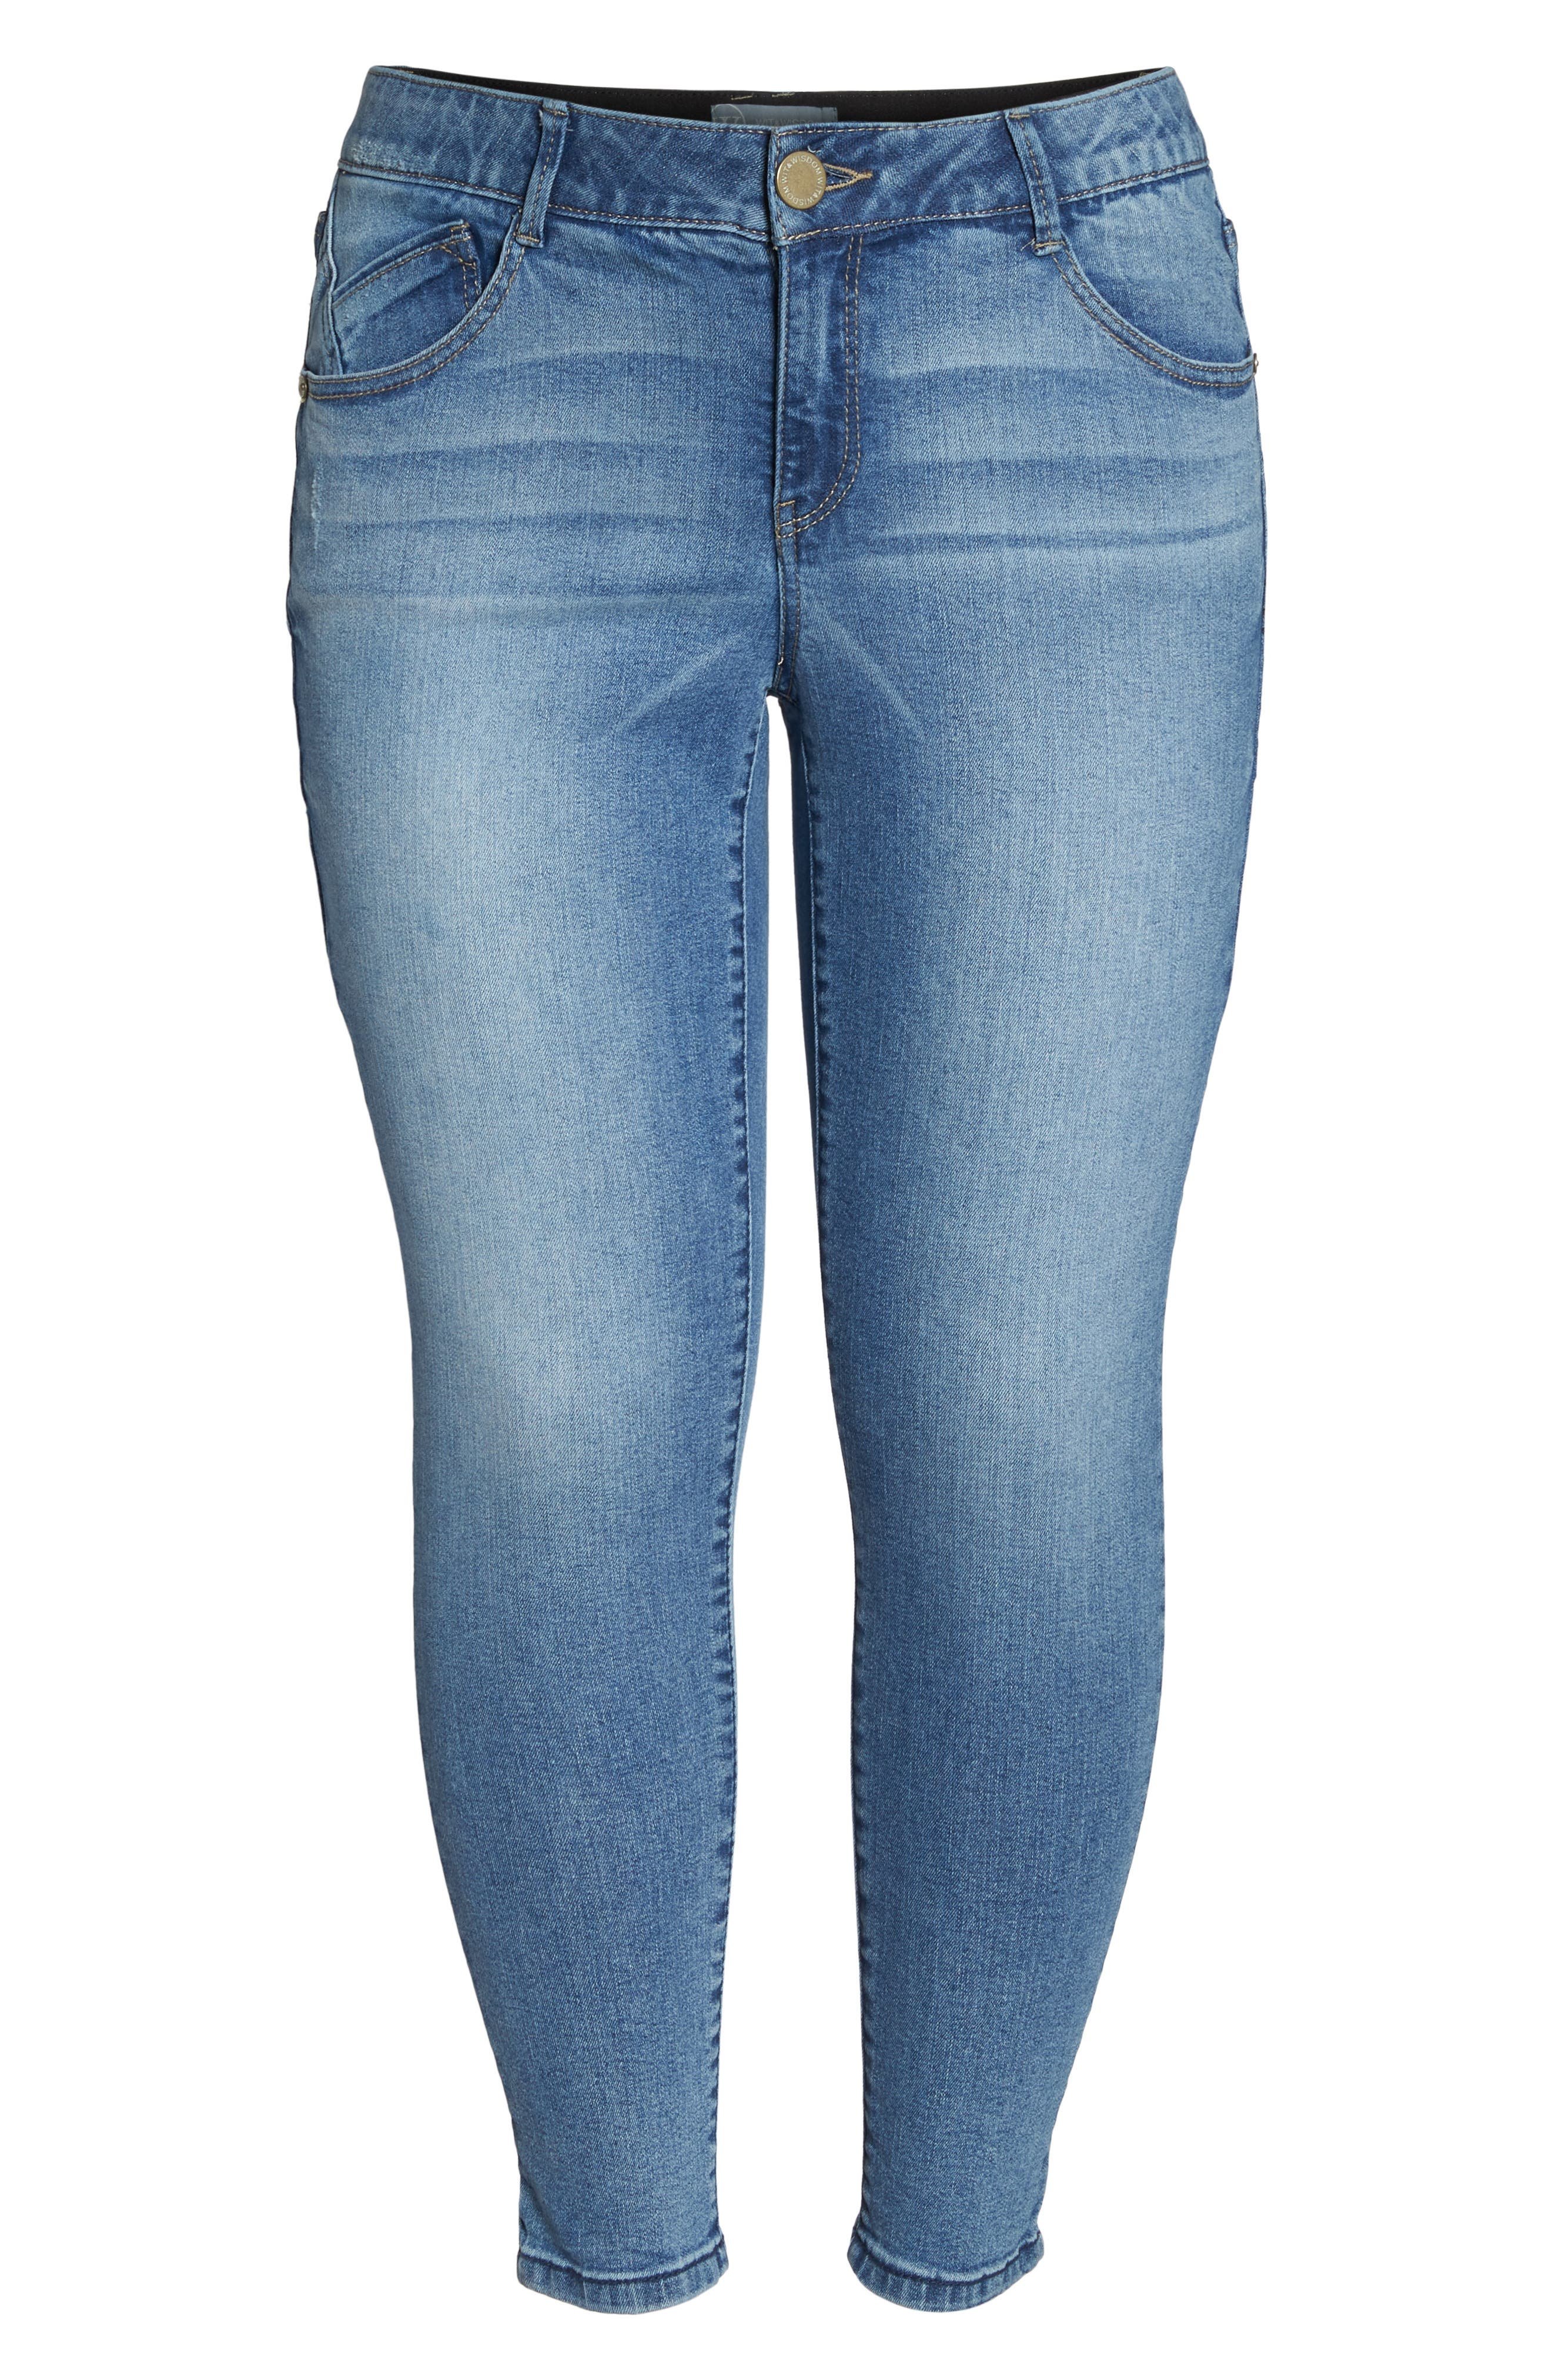 WIT & WISDOM,                             Ab-solution Stretch Ankle Skimmer Jeans,                             Alternate thumbnail 7, color,                             LIGHT BLUE